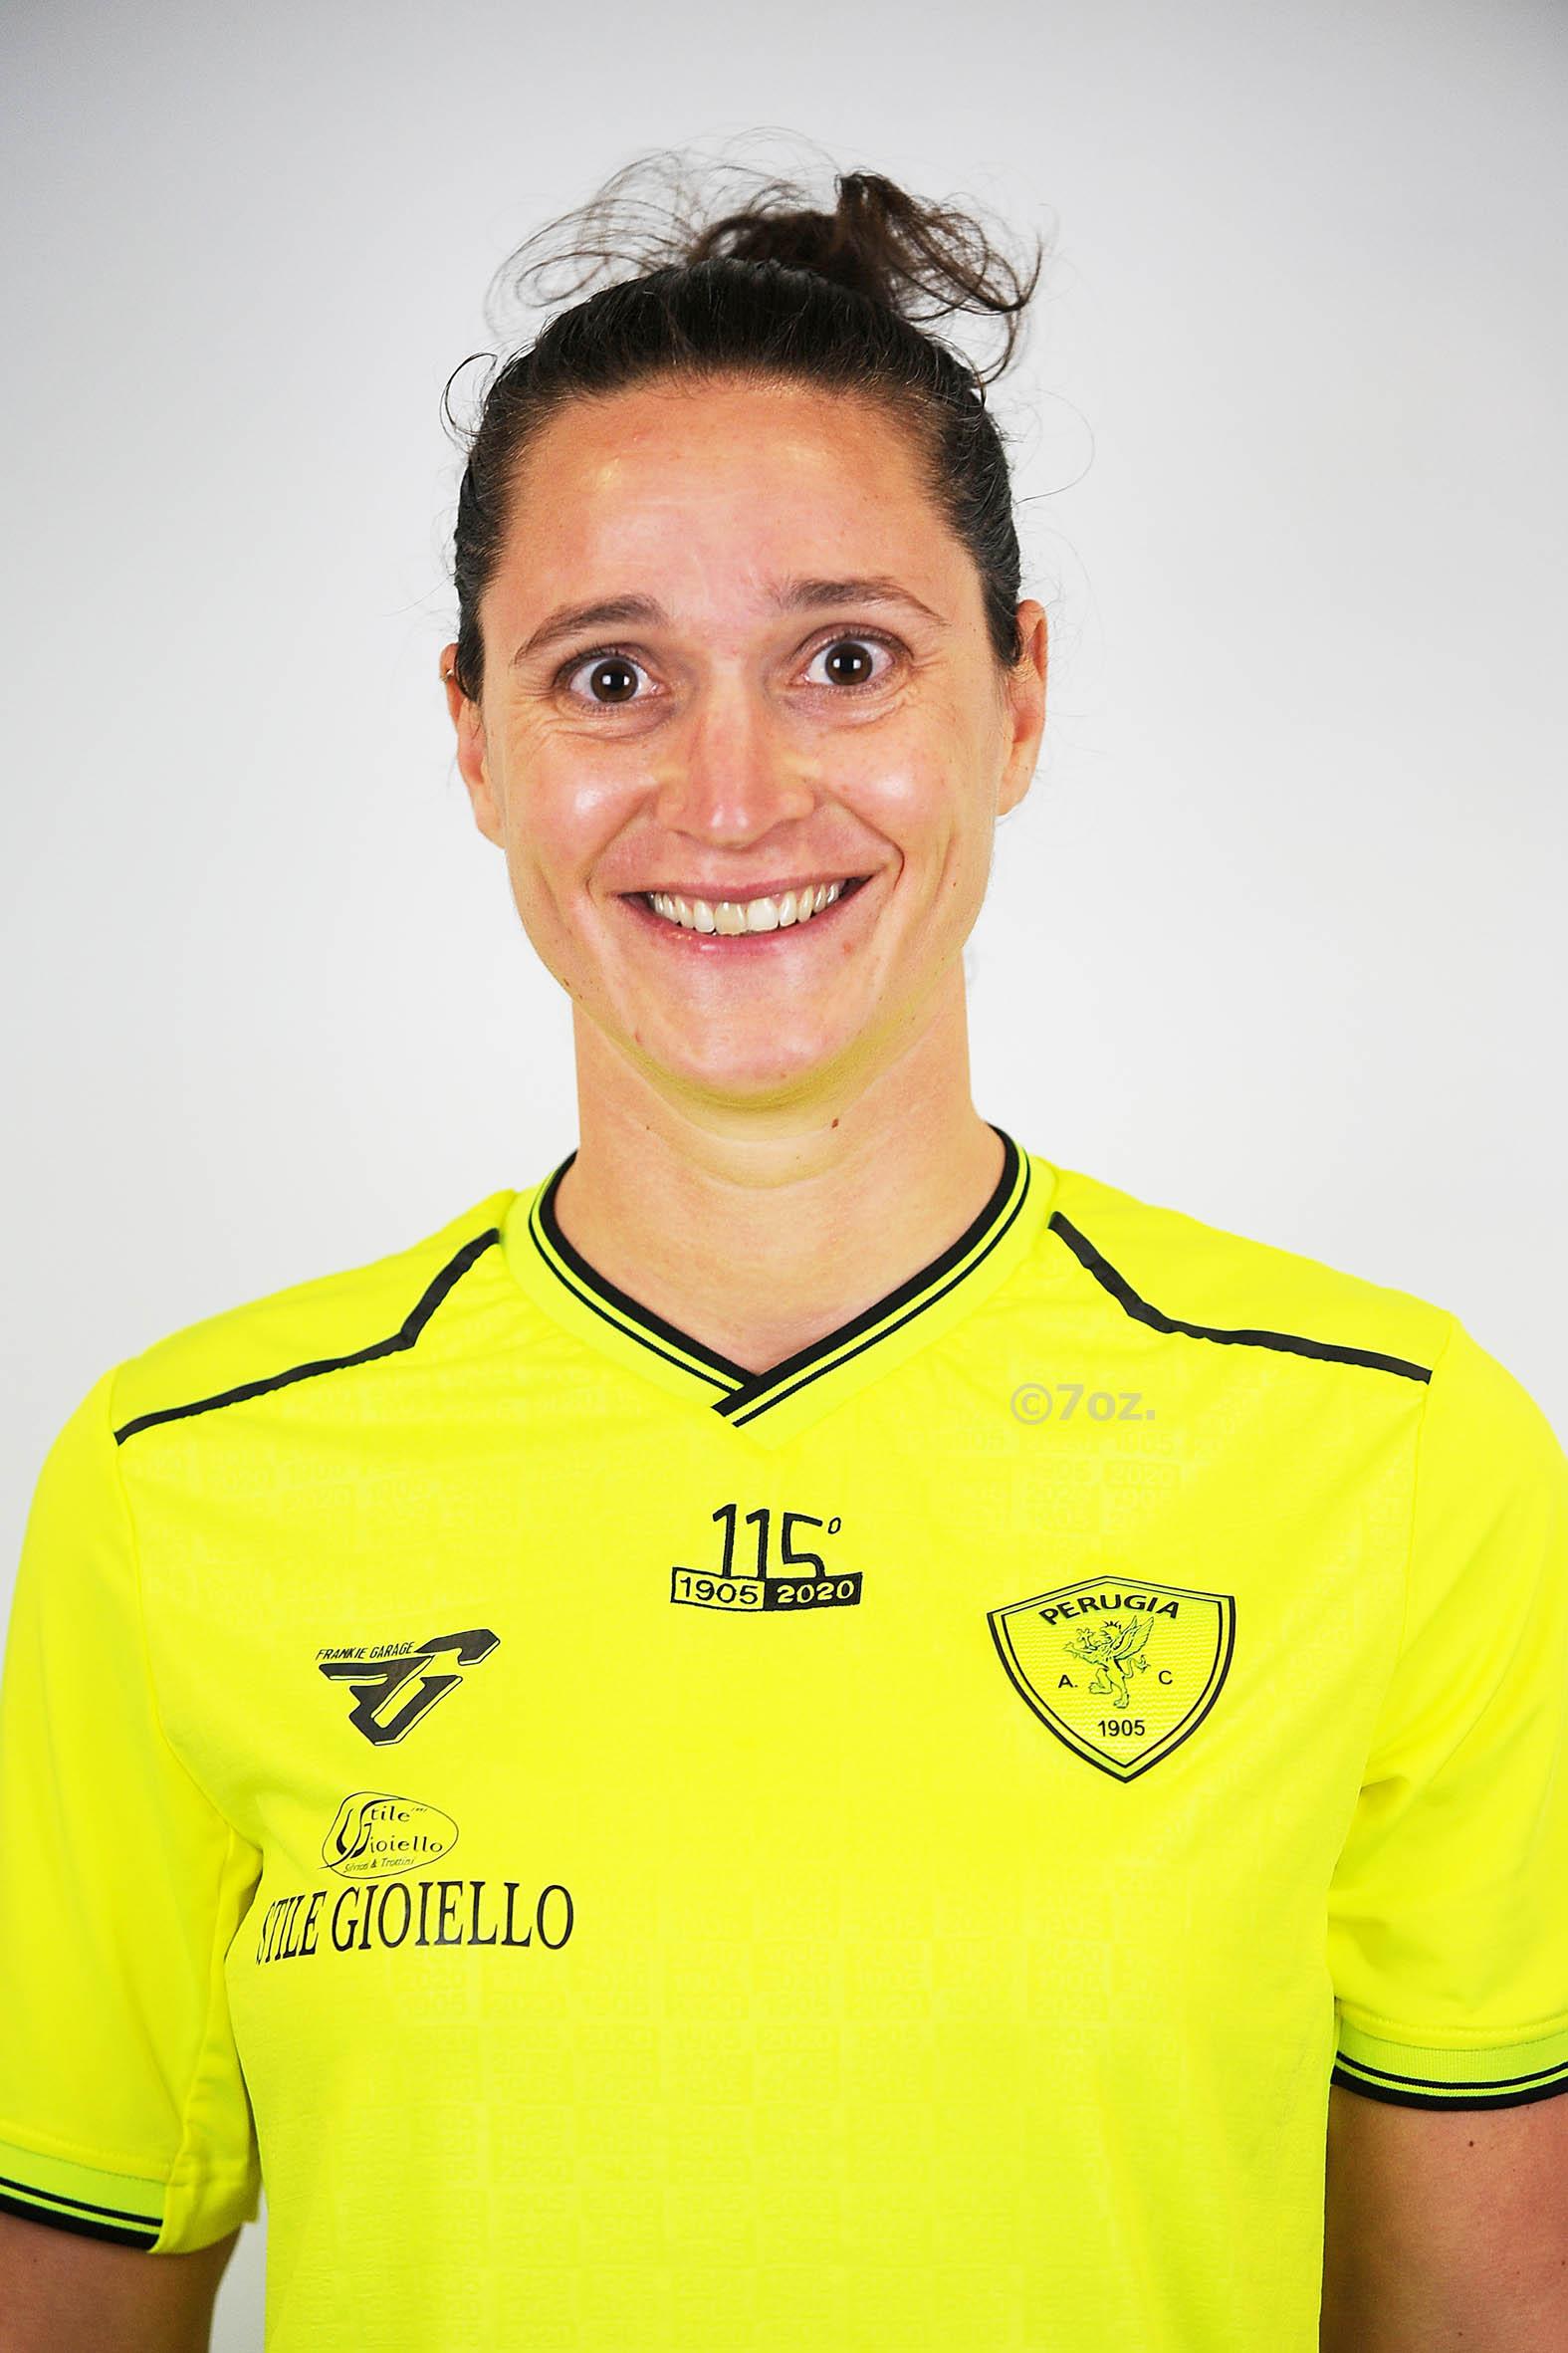 Oceane Marie BayolPortiere- A.C. Perugia Calcio